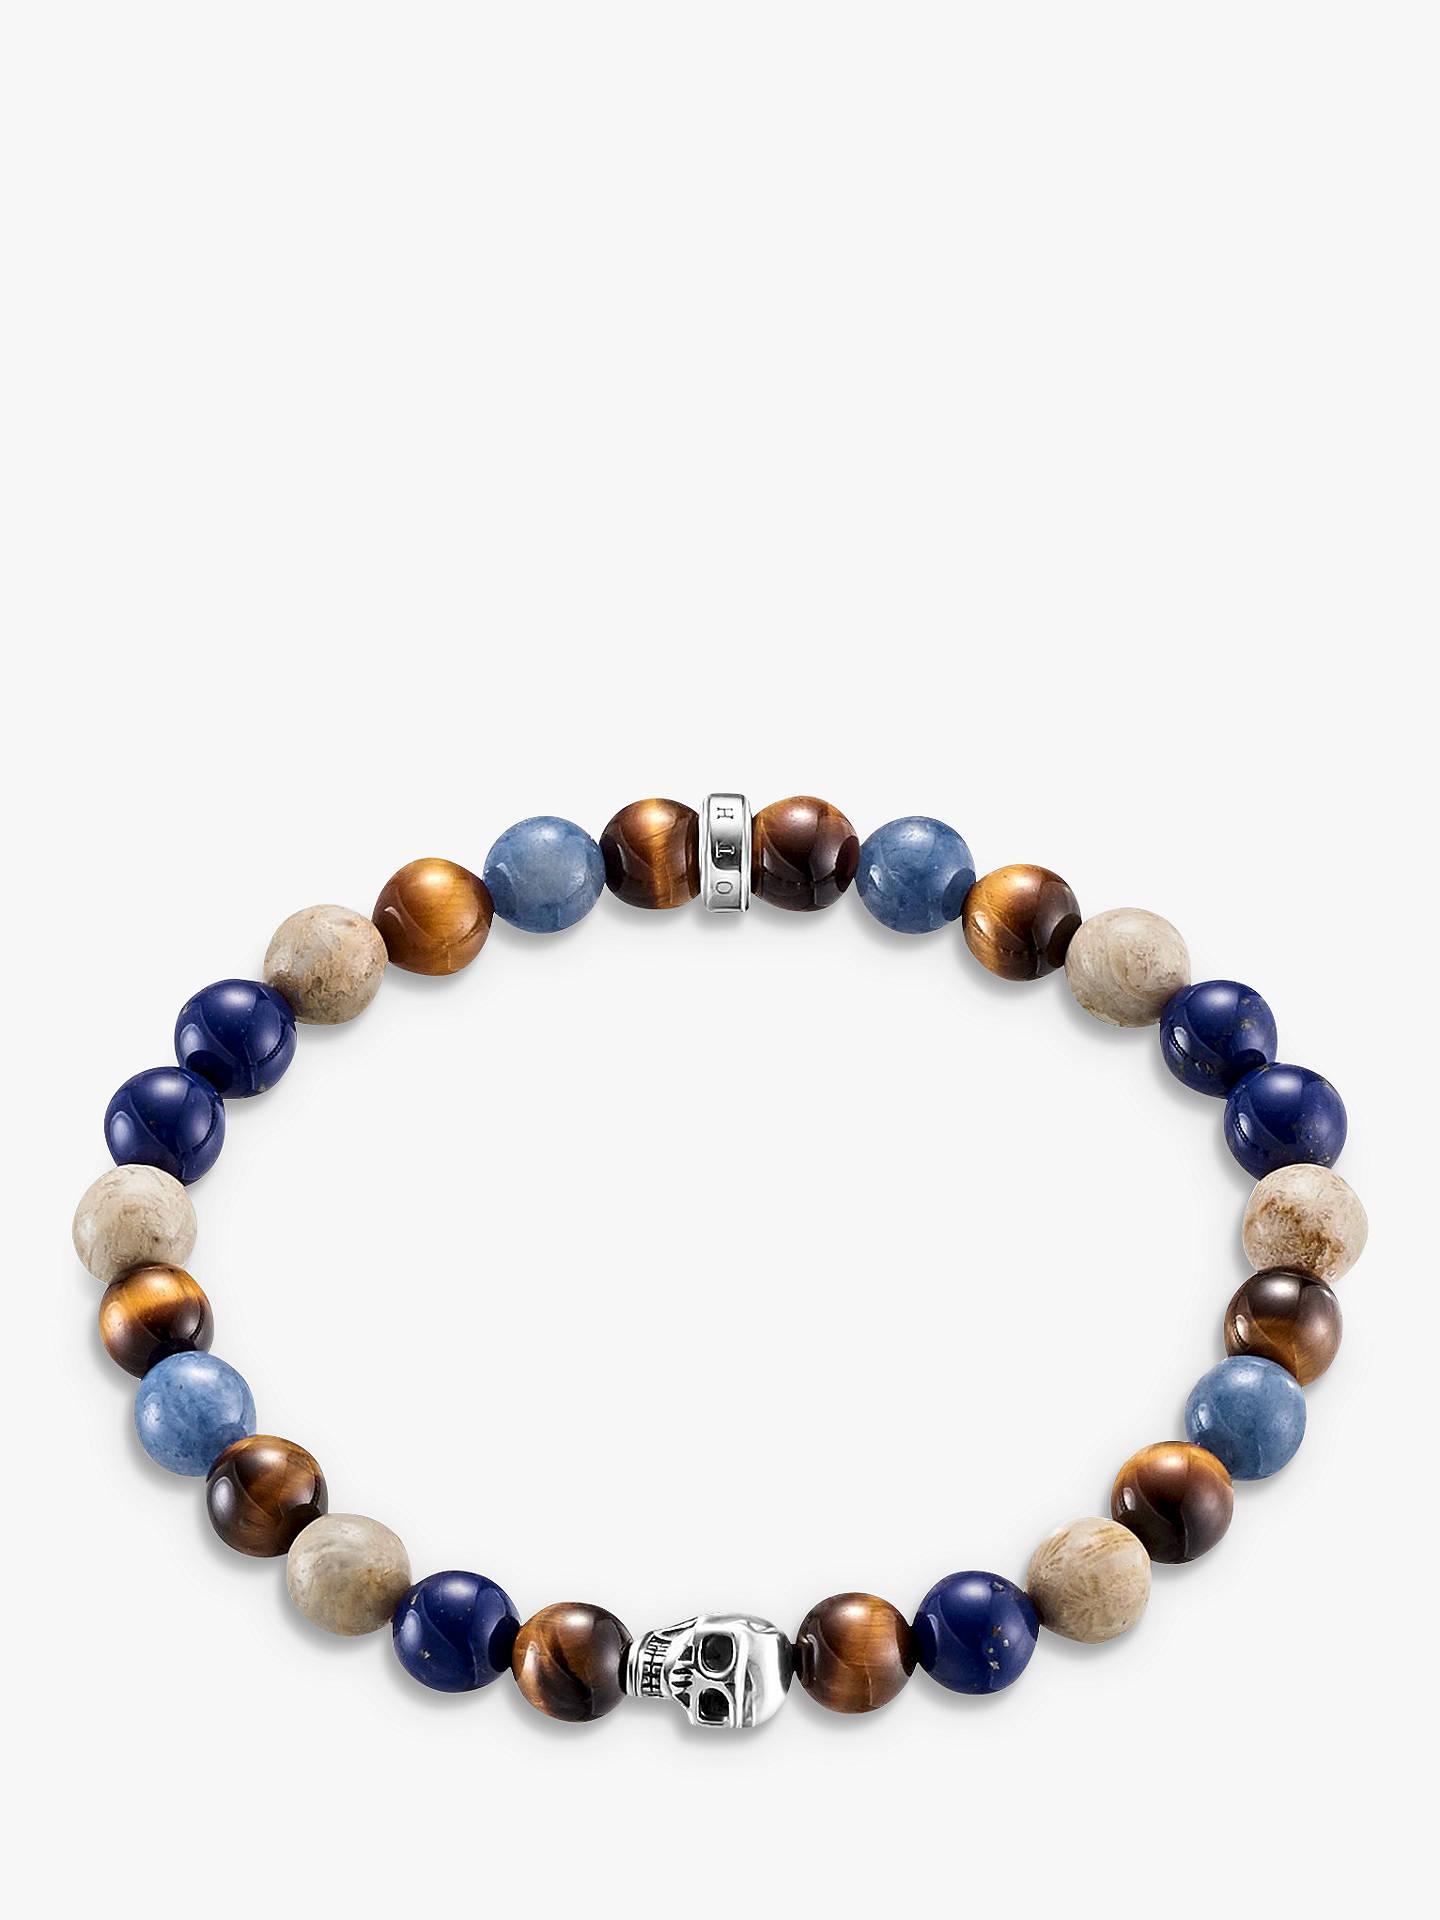 c2d3b86eab4 Buy THOMAS SABO Men's Sterling Silver Rebel At Heart Skull Stretch Bracelet,  Multi Online at ...